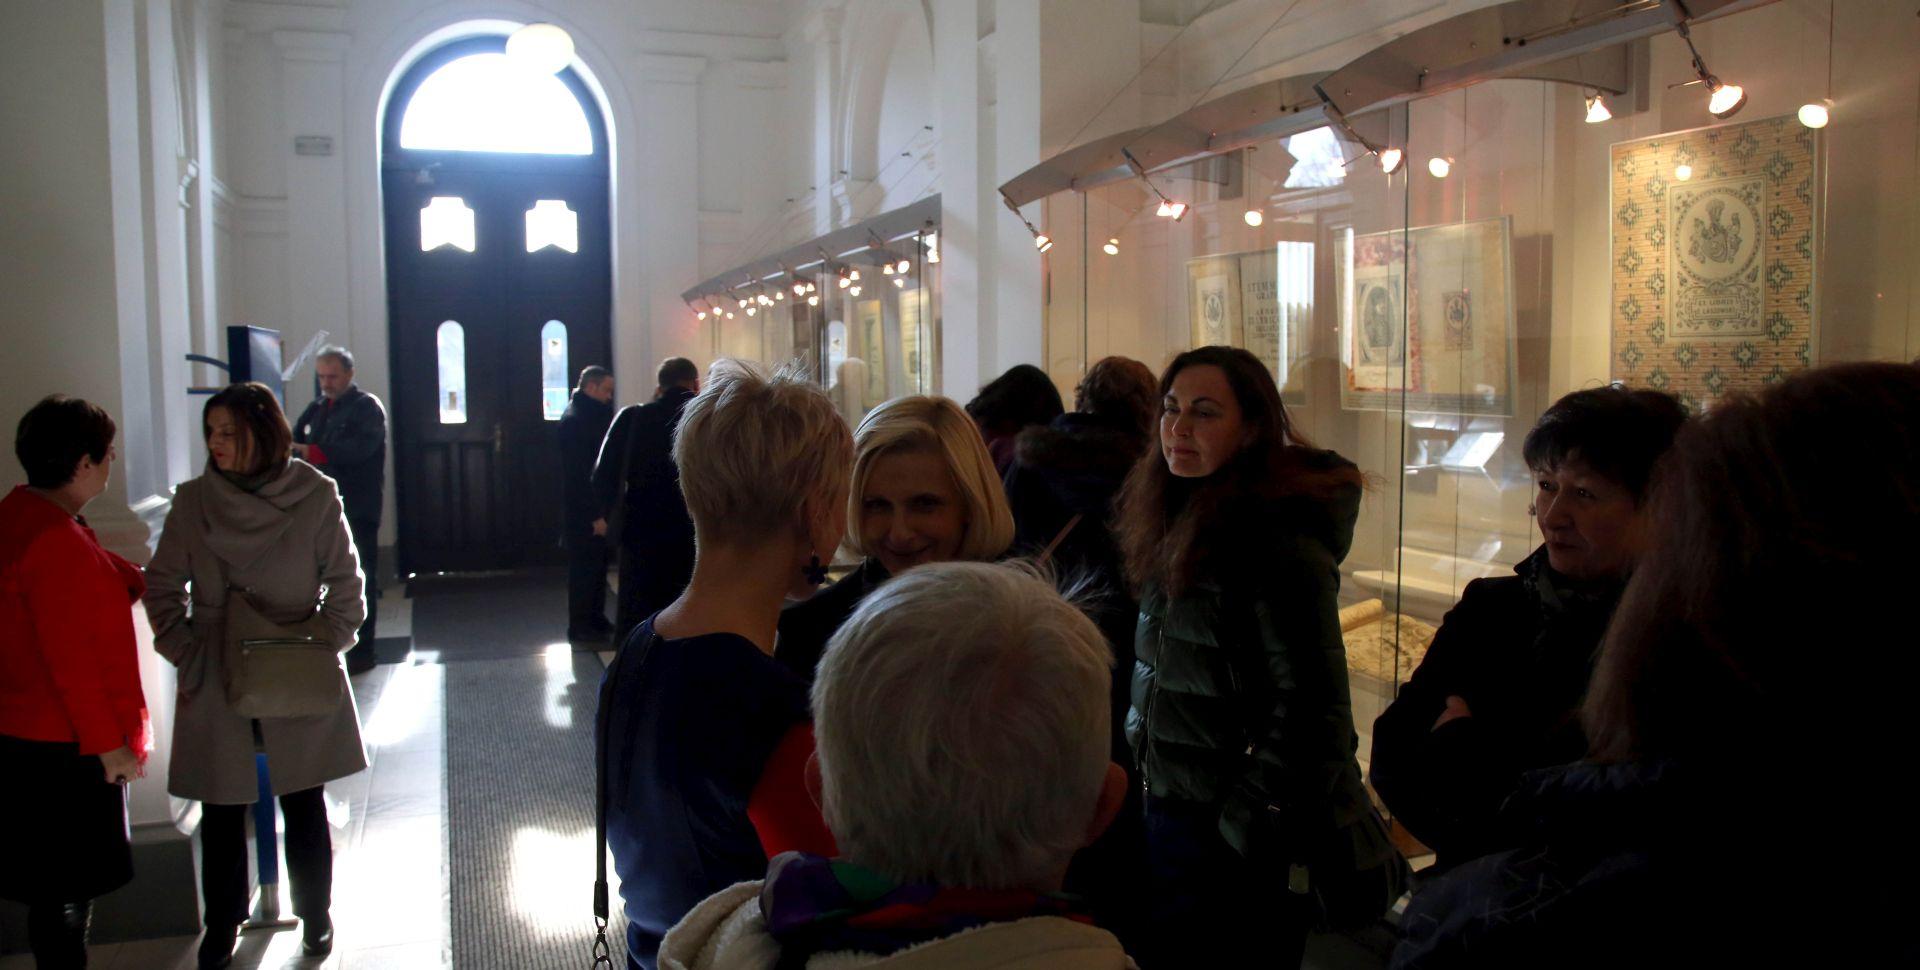 Svečano otvoren Tjedan otvorenih vrata zagrebačke Gradske knjižnice